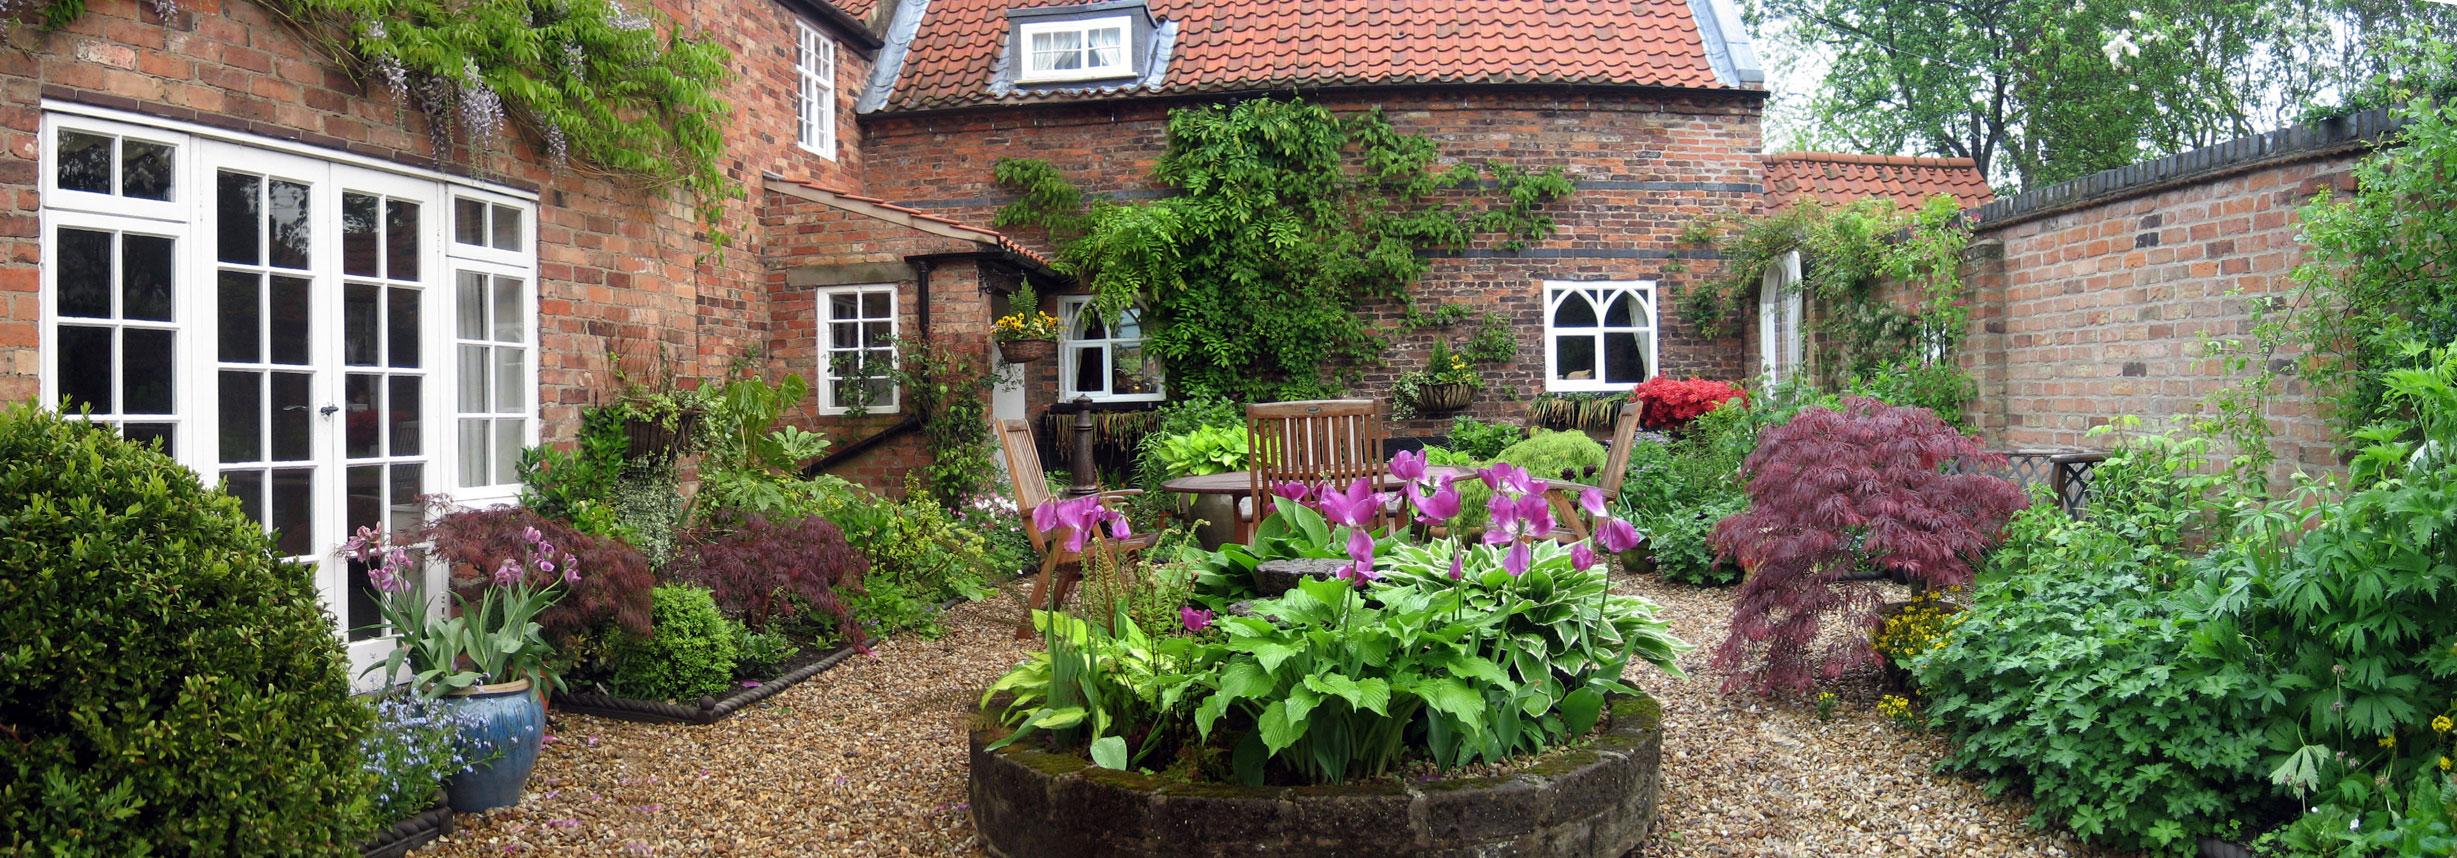 Traditional Garden Ideas 3 Renovation Ideas EnhancedHomes Org